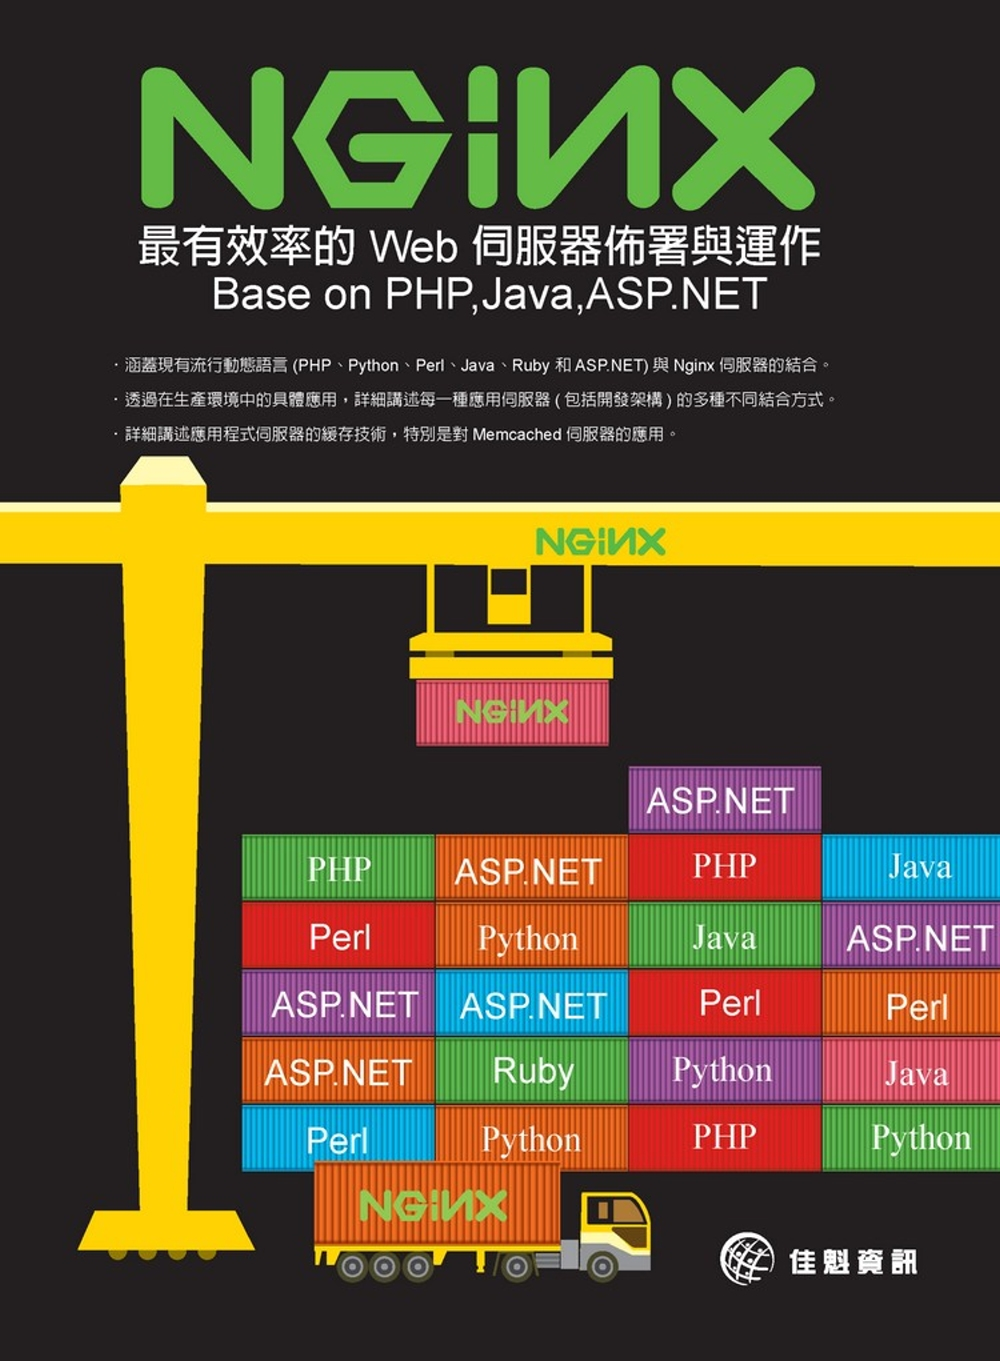 Nginx-最有效率的 Web 伺服器佈署與運作 Base on PHP,Java,ASP.NET